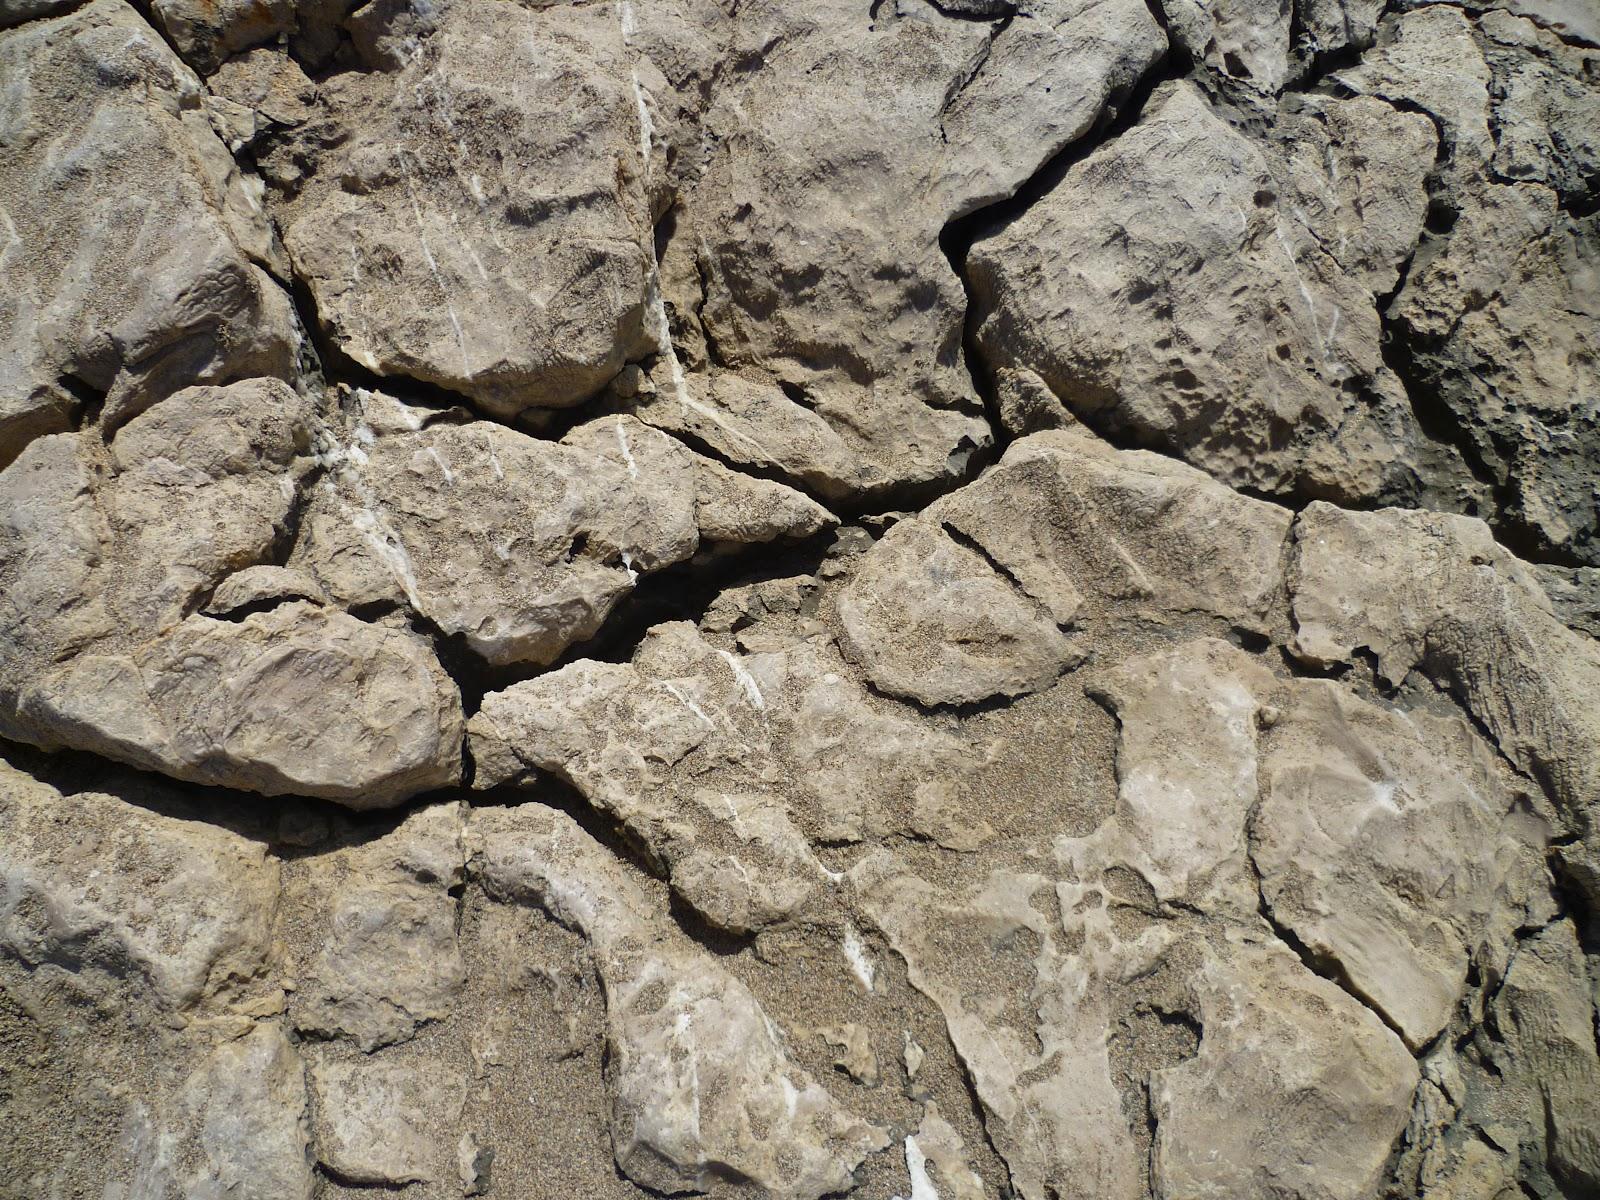 textura de roca todas las texturas